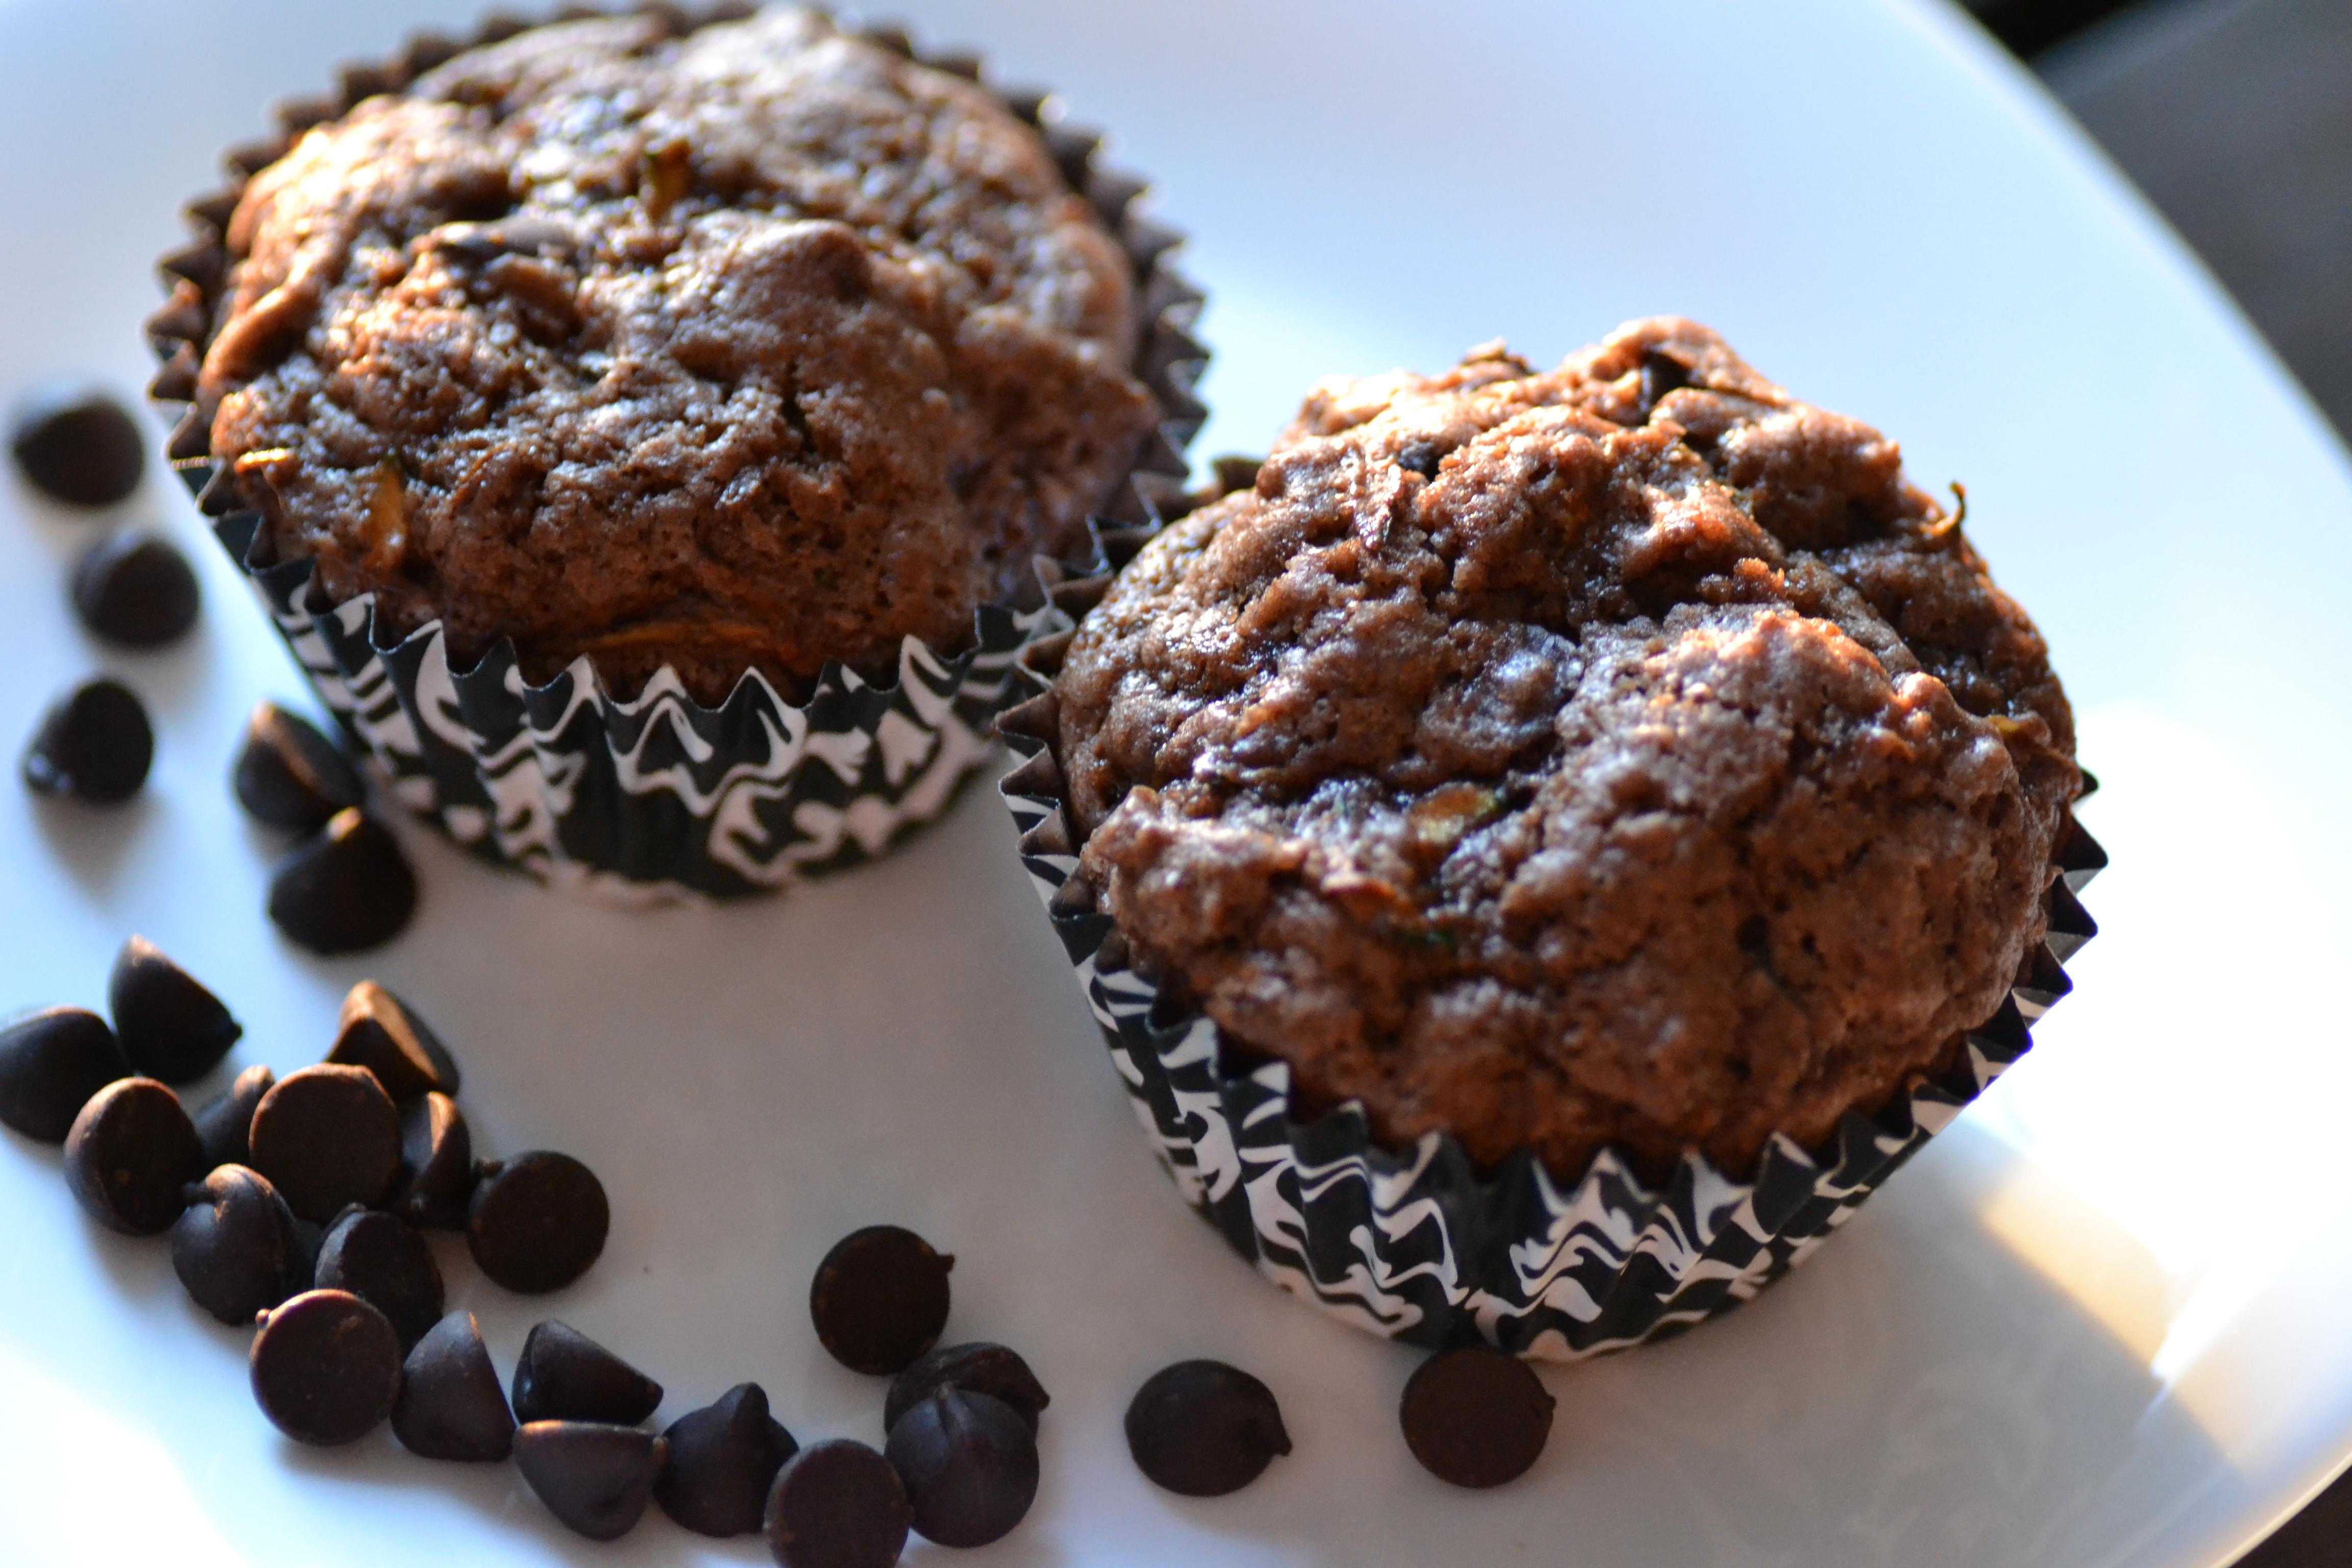 Chocolate Zucchini Muffins  Double Chocolate Zucchini Muffins Warm Vanilla Sugar